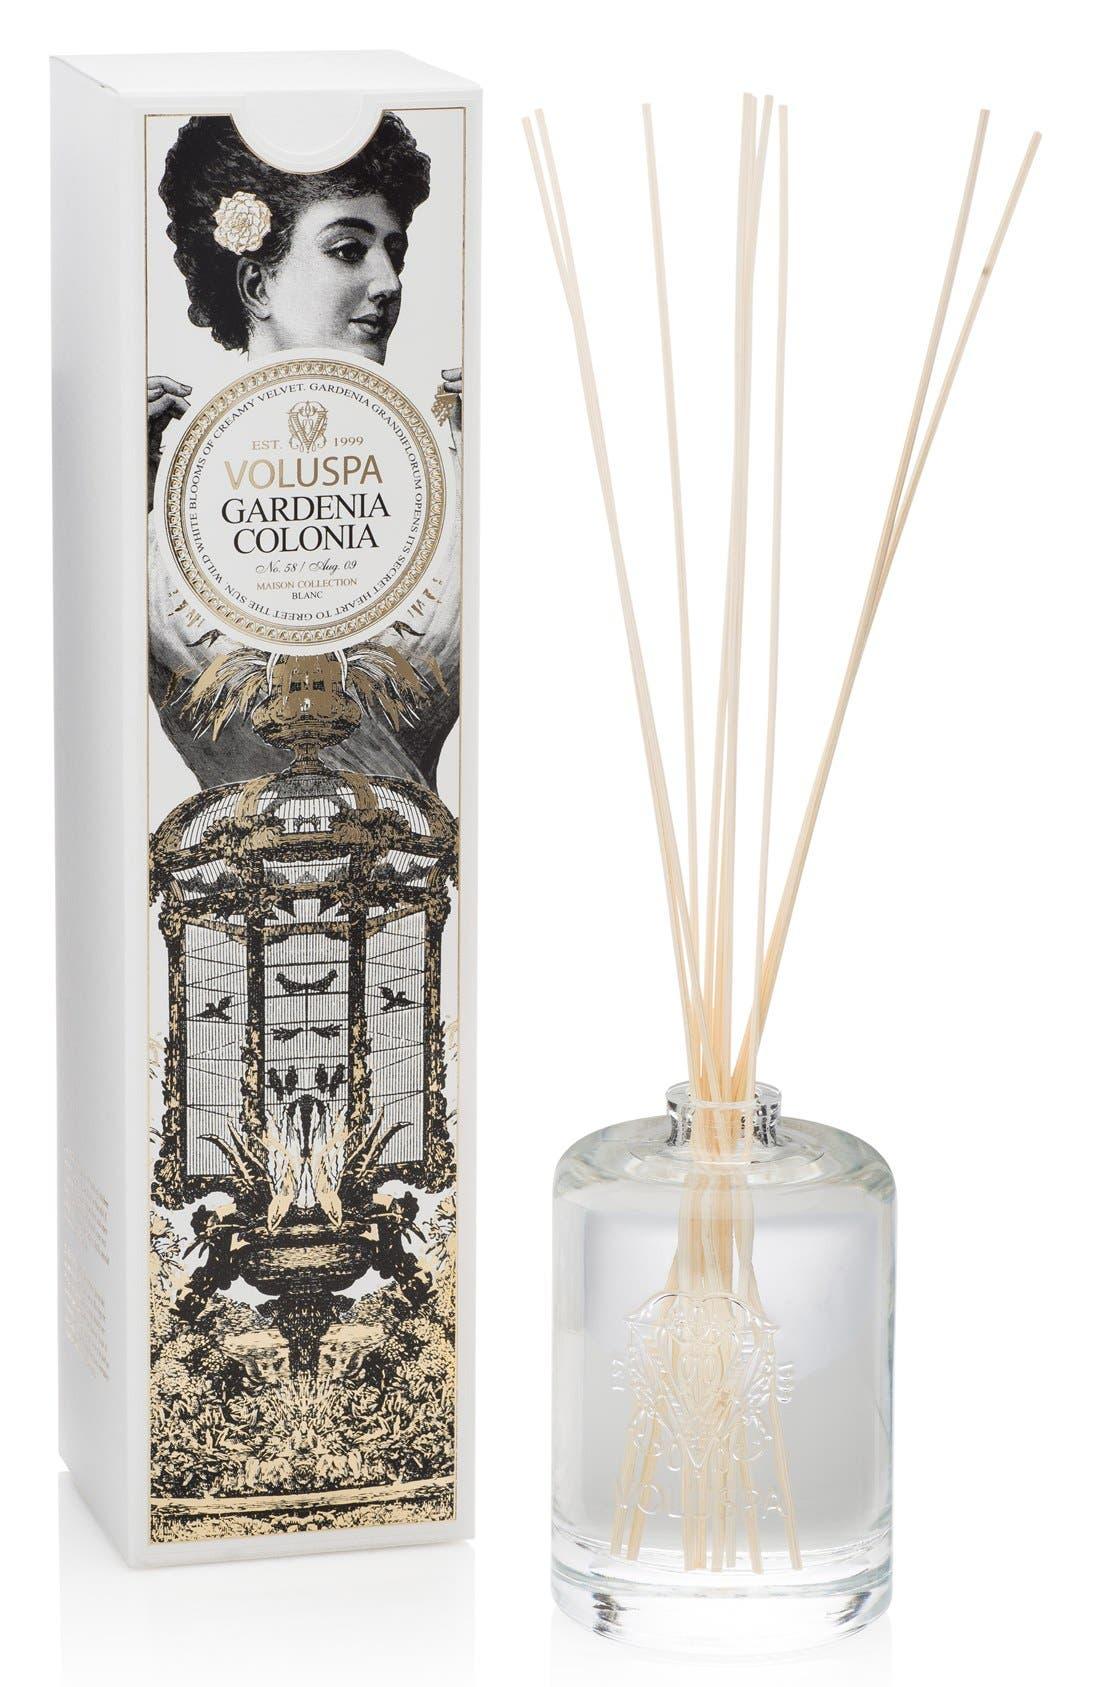 Voluspa 'Maison Blanc - Gardenia Colonia' Home Ambience Diffuser